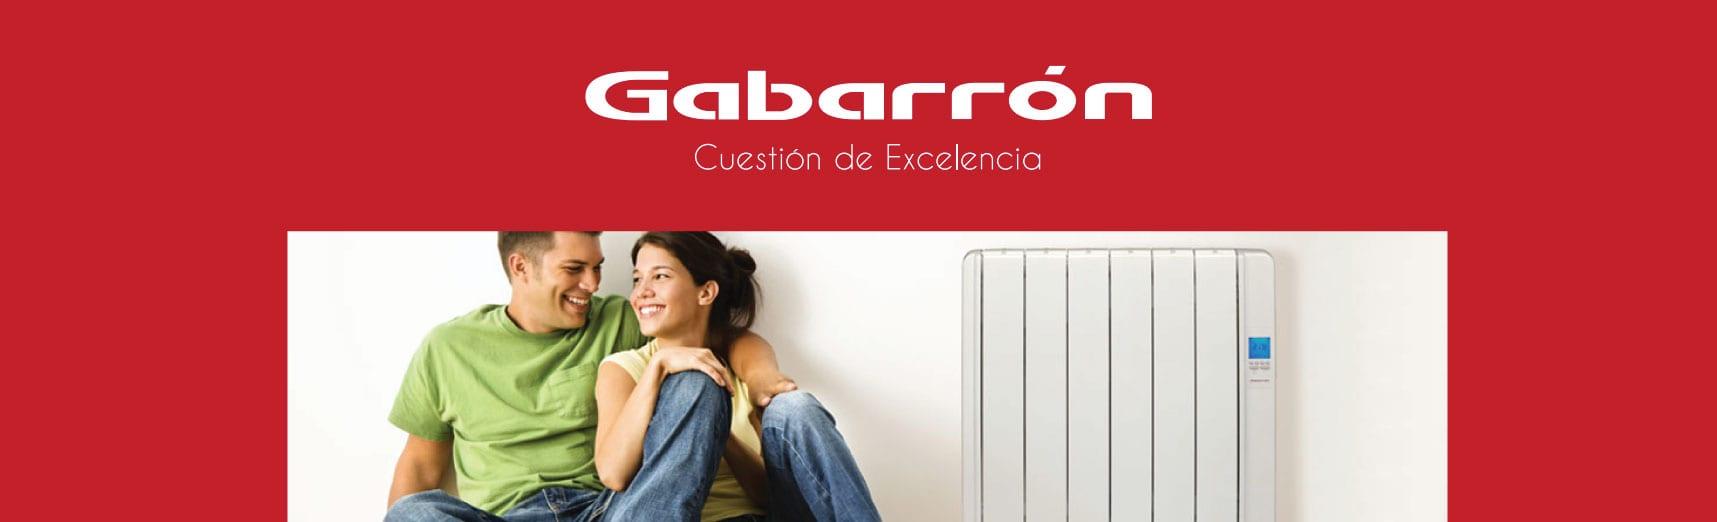 gabarron-distribuidor-espana-hiper-antena